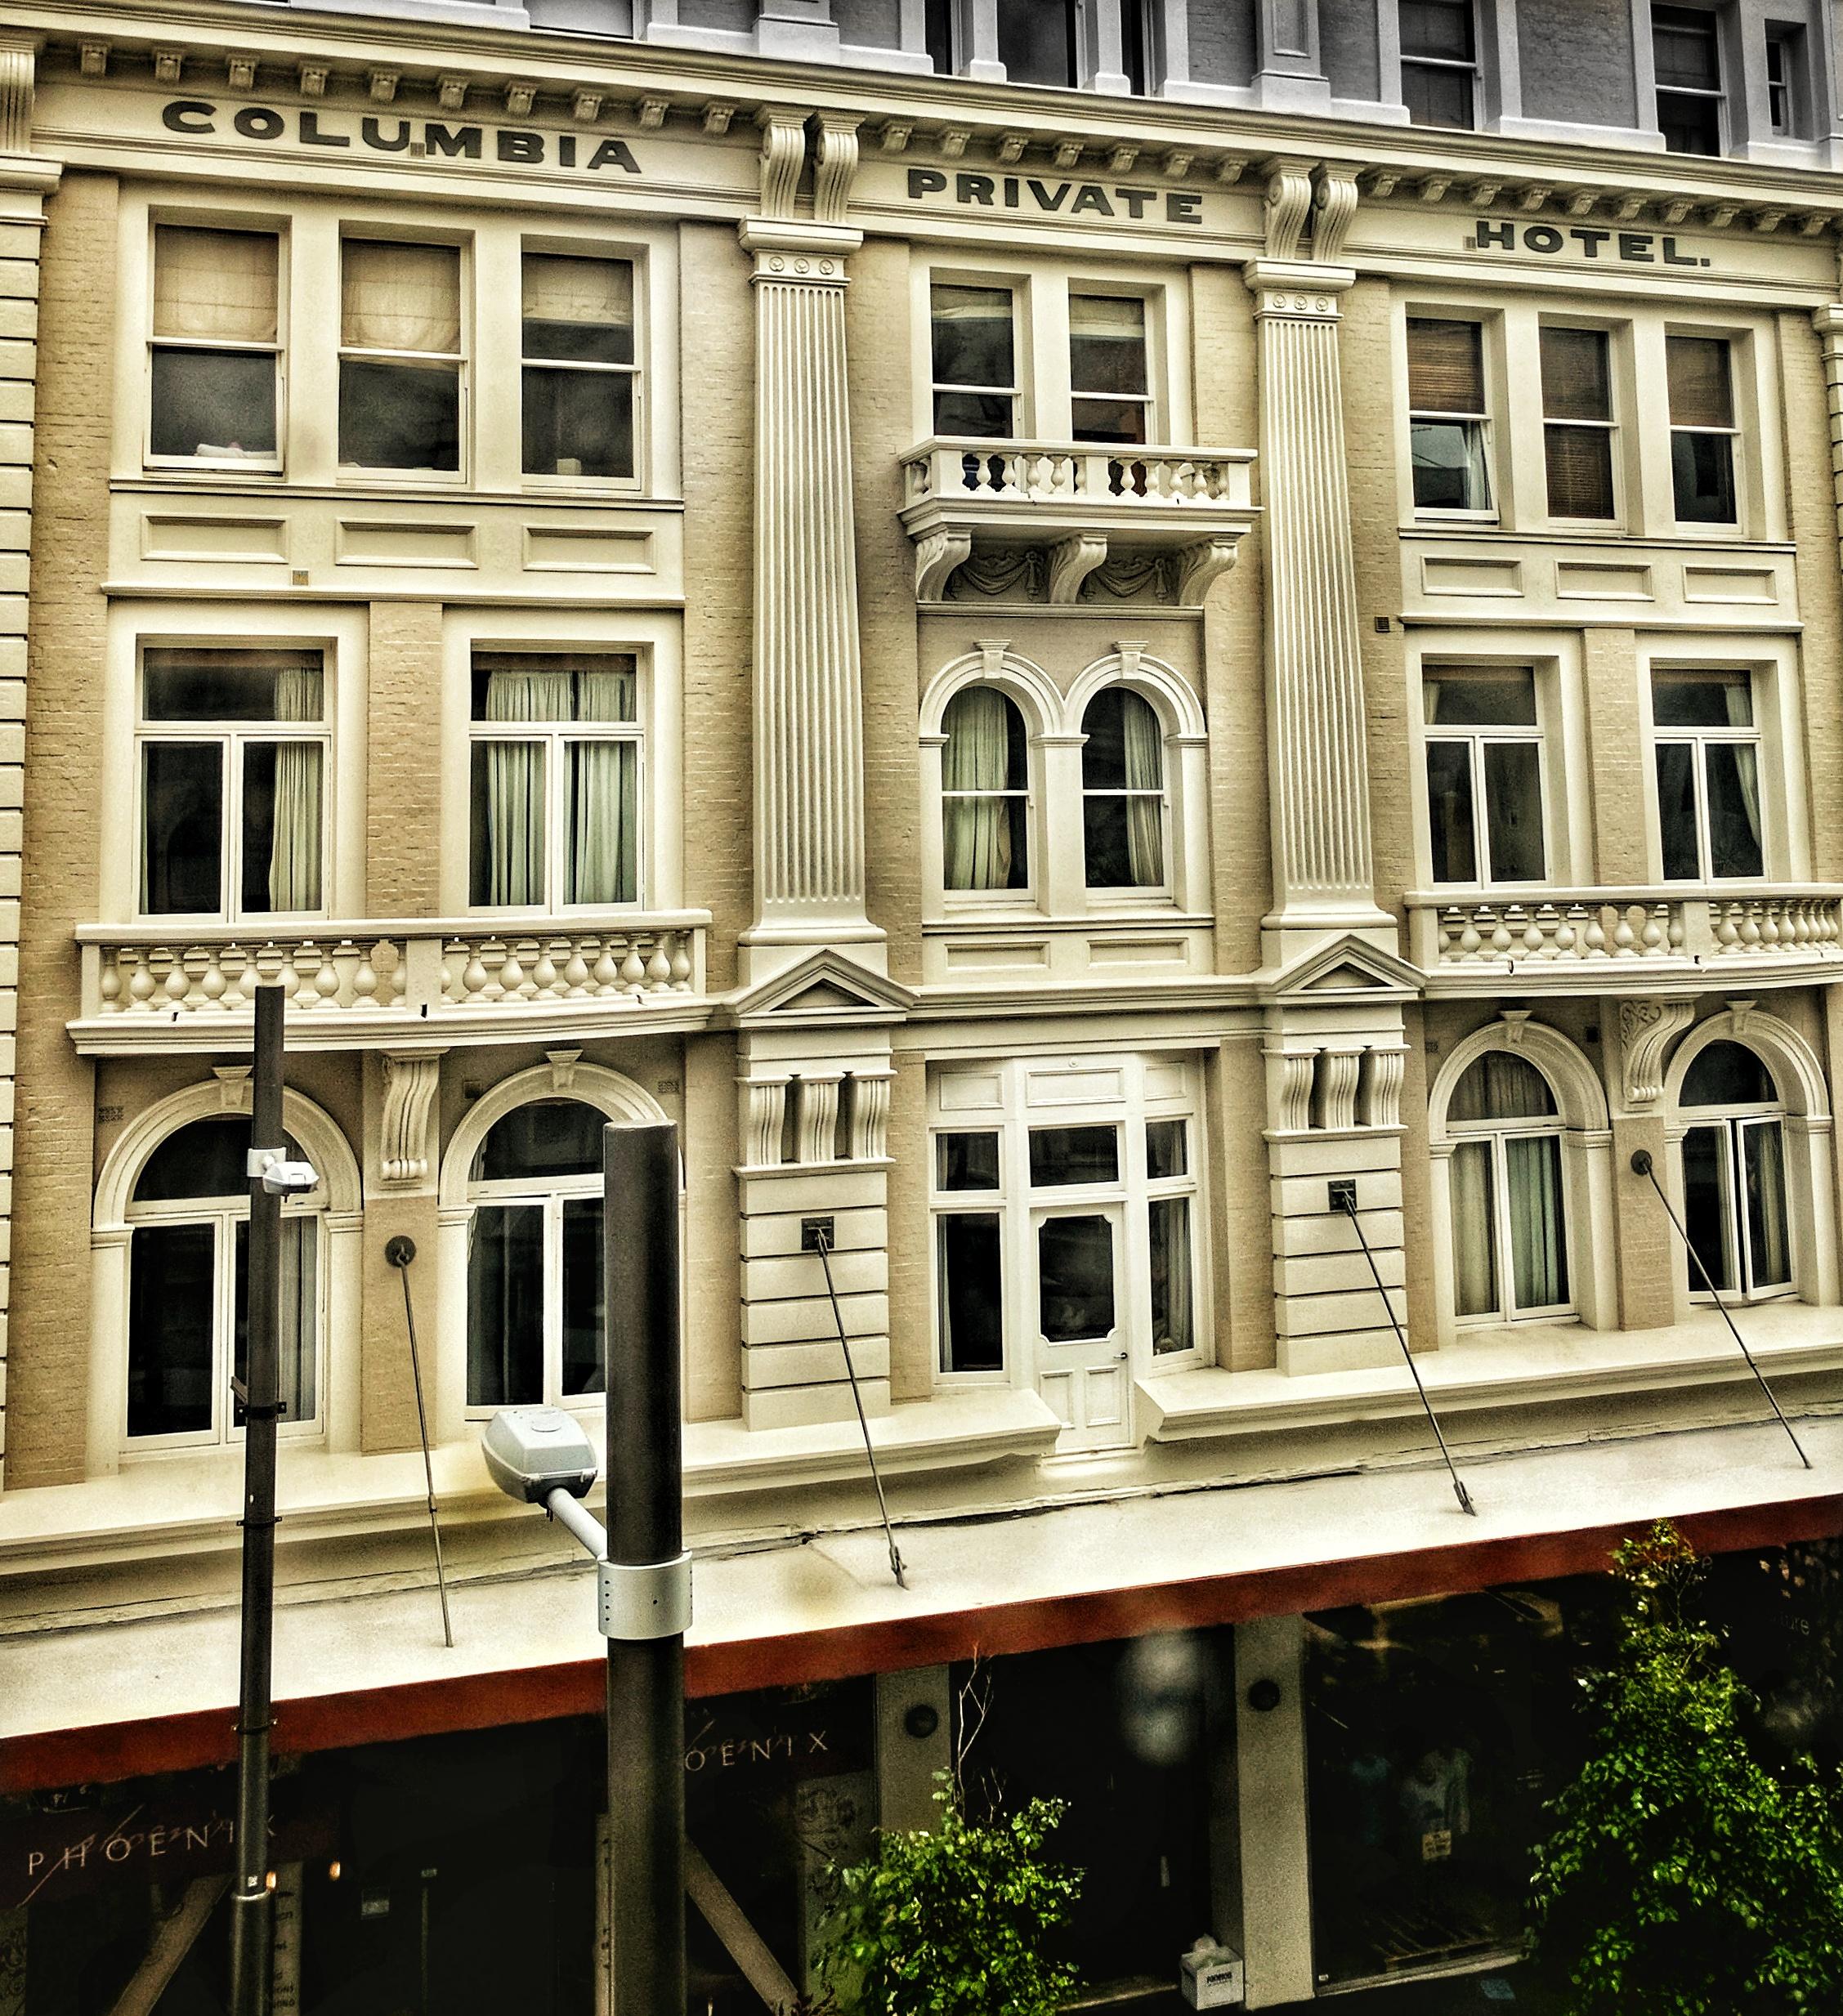 Columbia Private Hotel building, Cuba Street (Wellington, NZ)